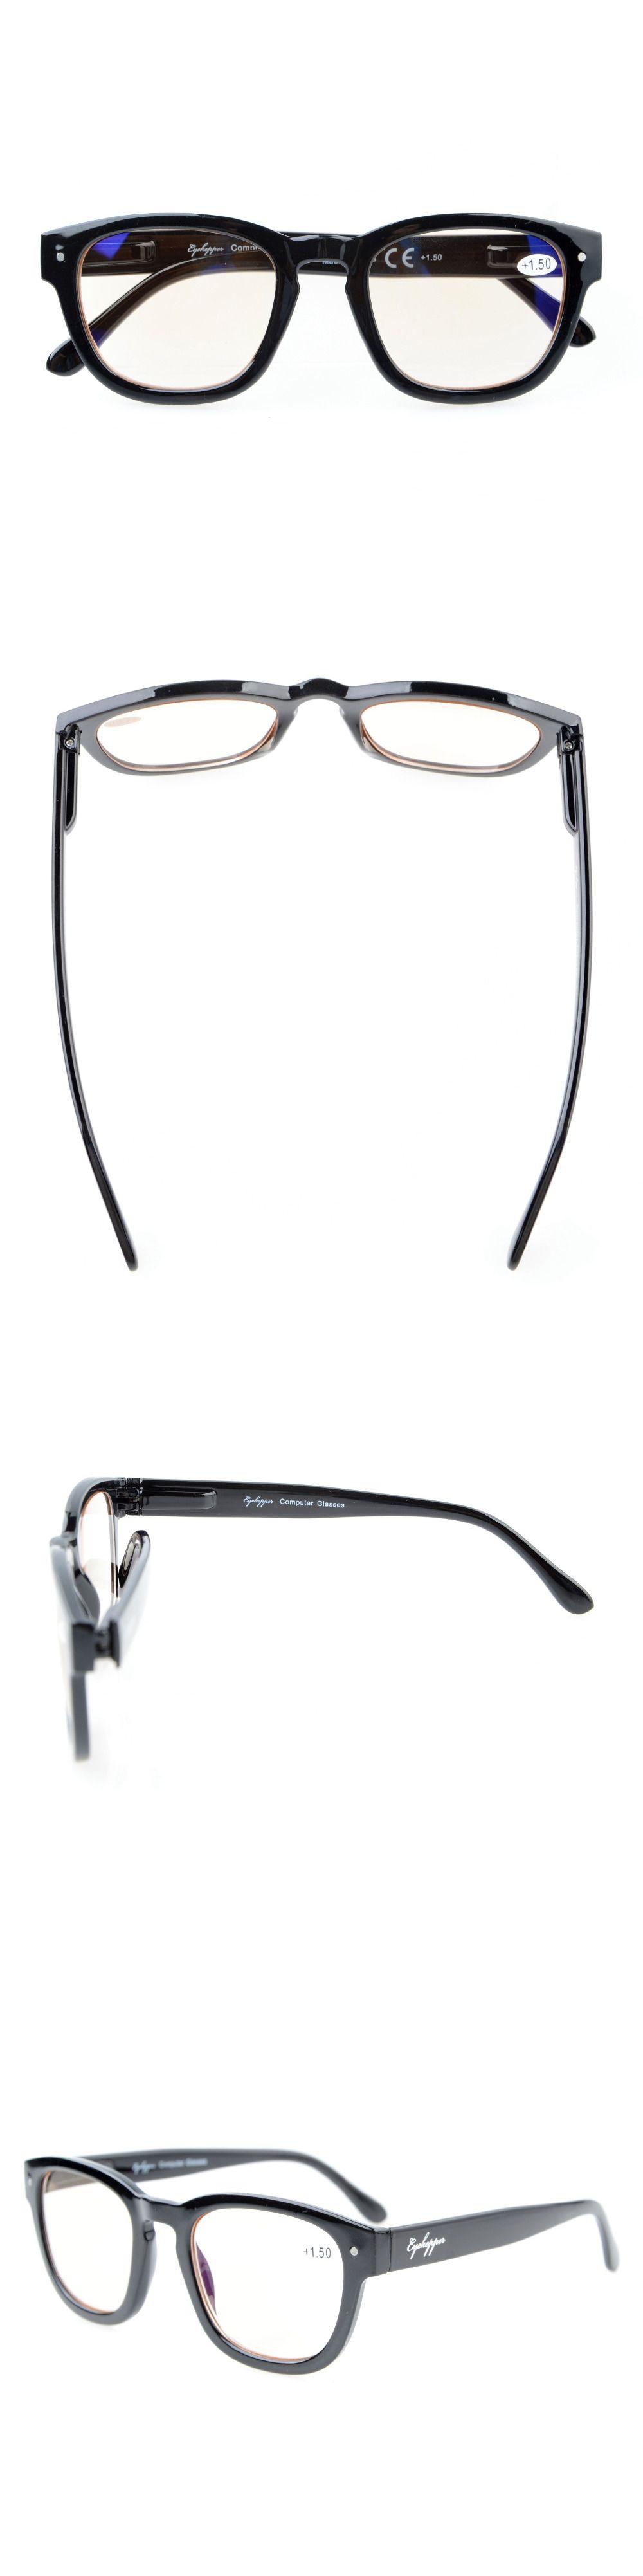 9c7070b88c CG089 Eyekepper Amber Tinted Lenses Computer Readers Professor Vintage  Style Spring Hinges Arms Computer Reading Glasses